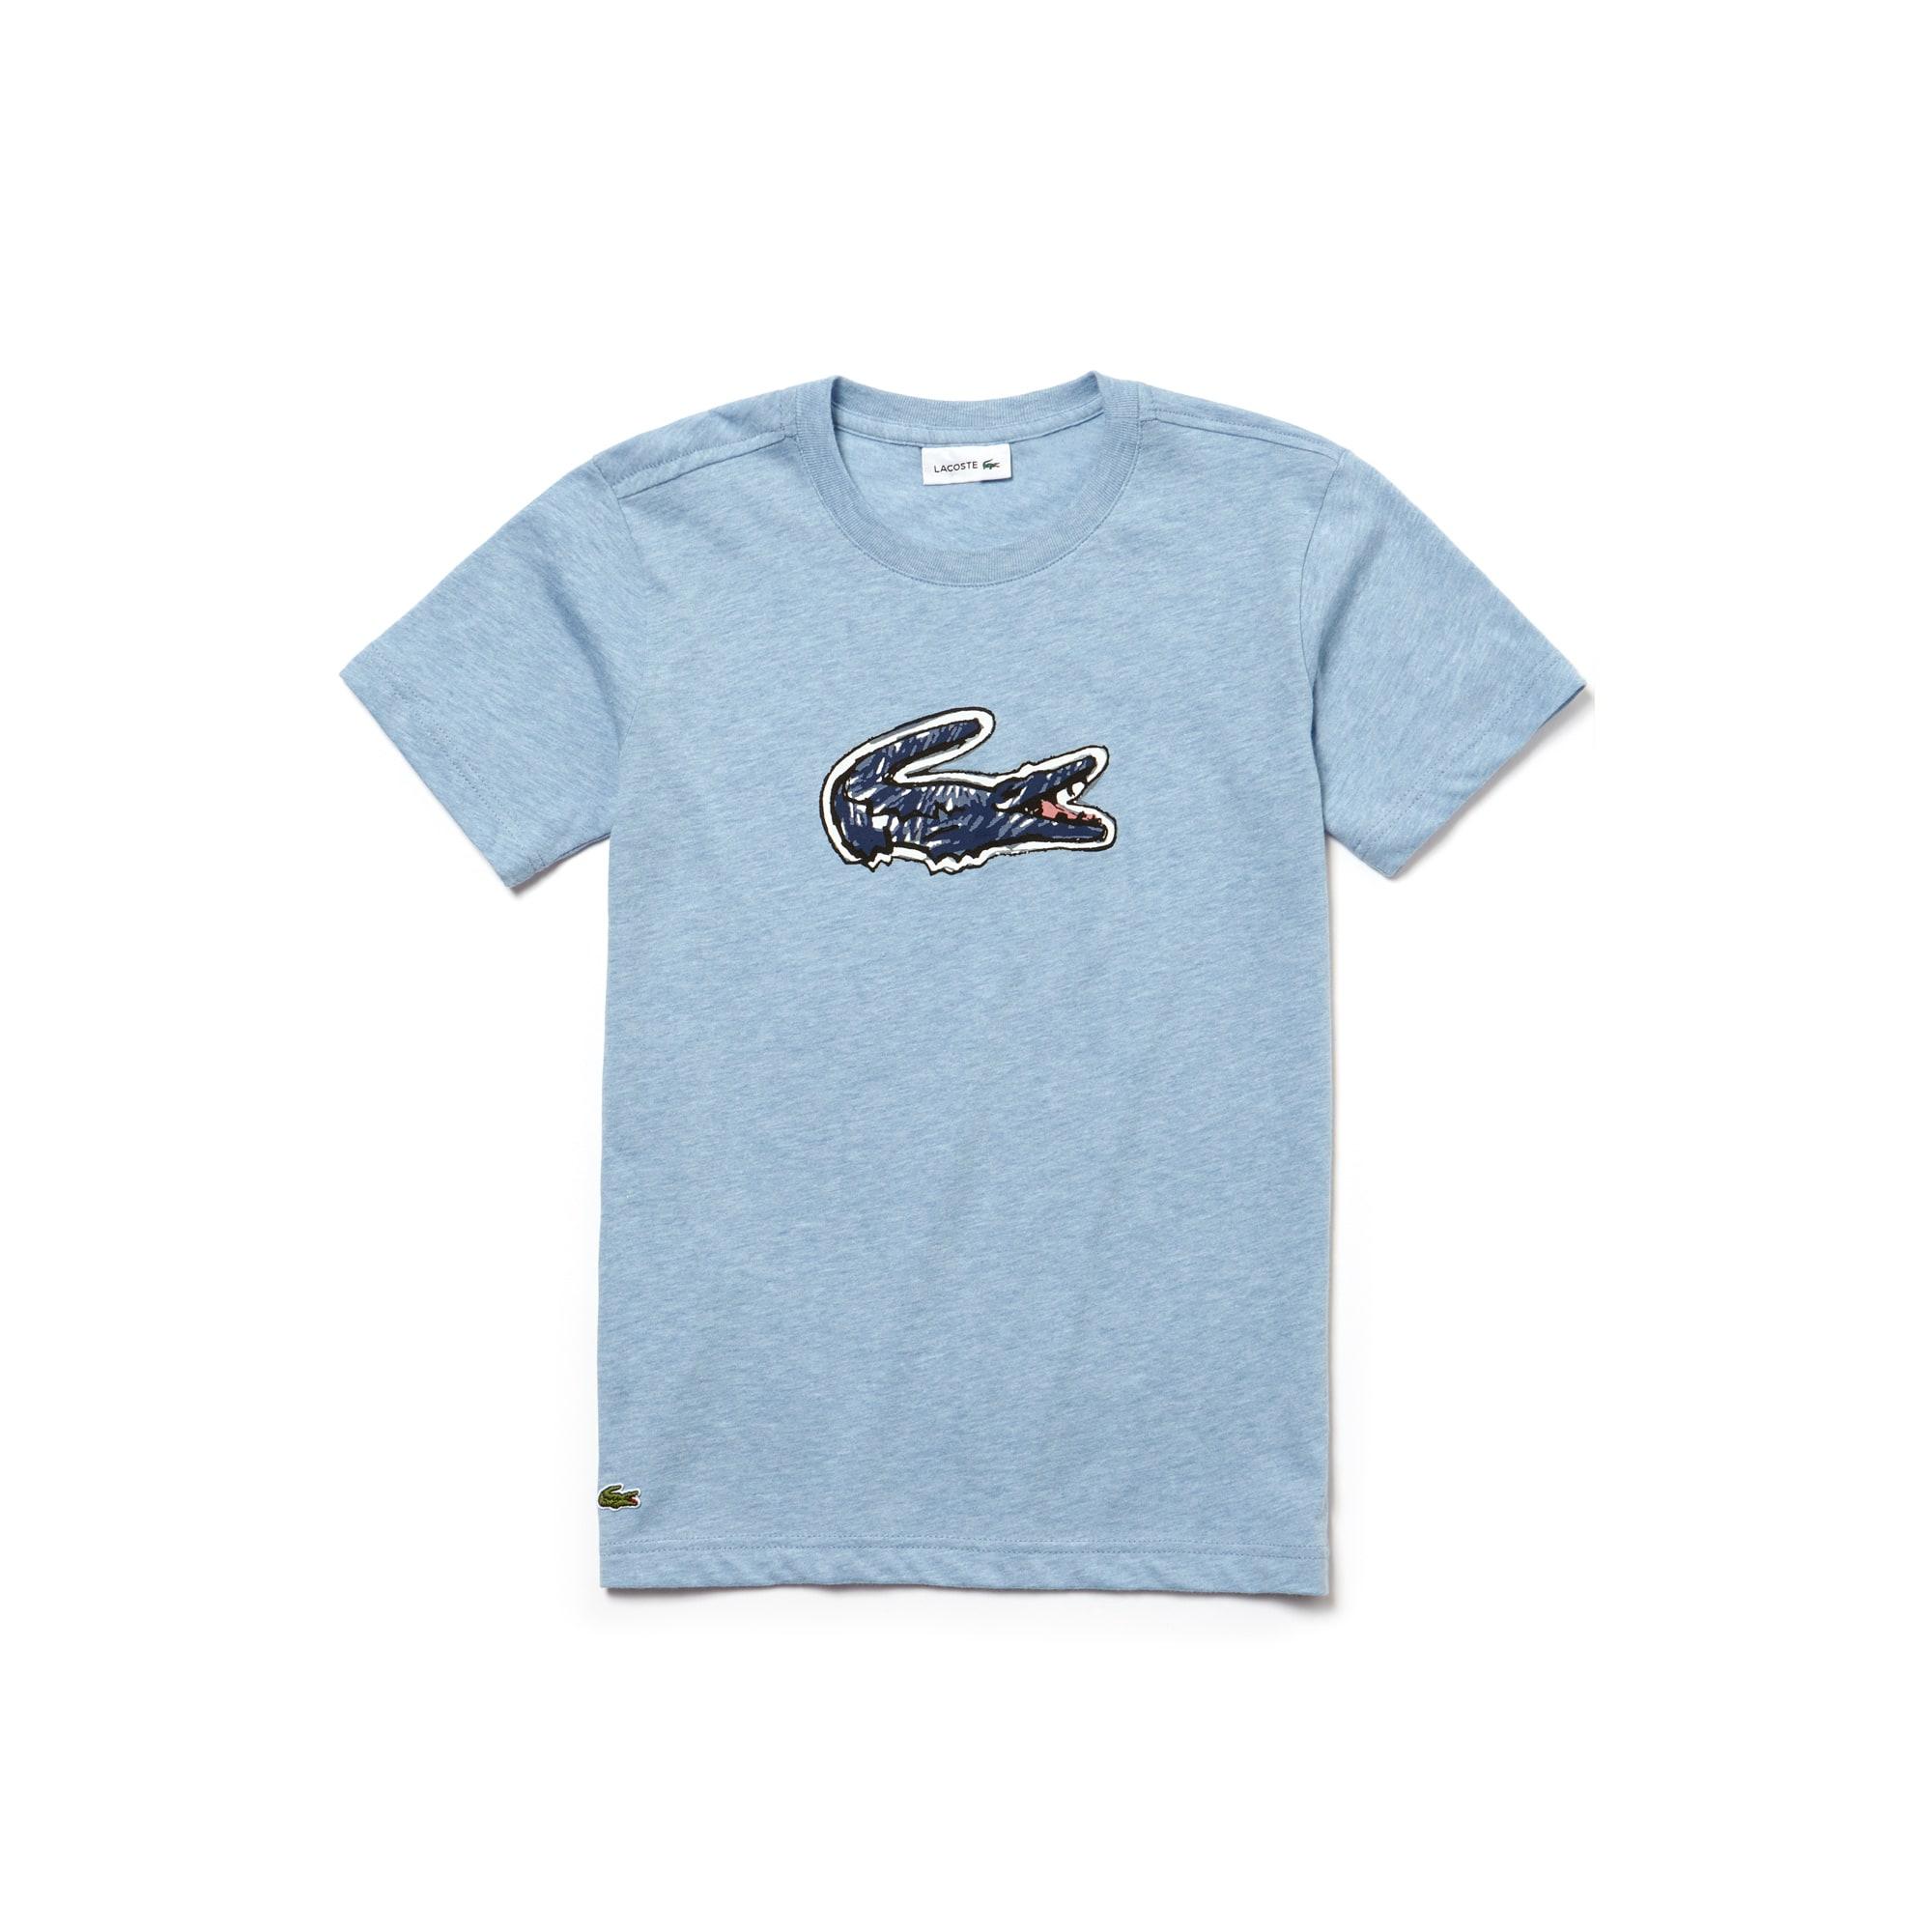 Boys' Crew Neck Crocodile Print Indigo Jersey T-shirt